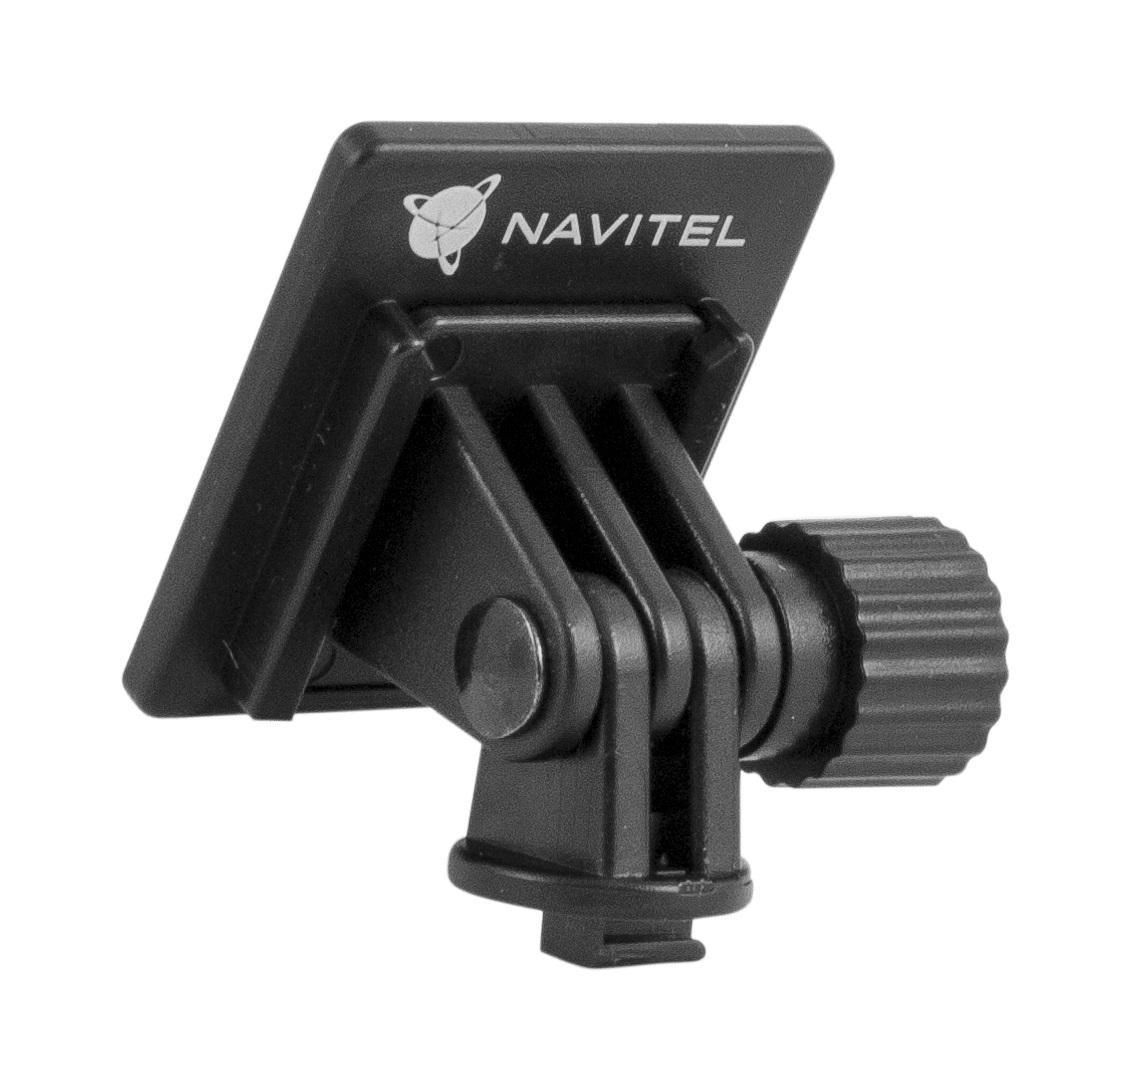 Dashcam NAVITEL NAVR400NV Bewertung